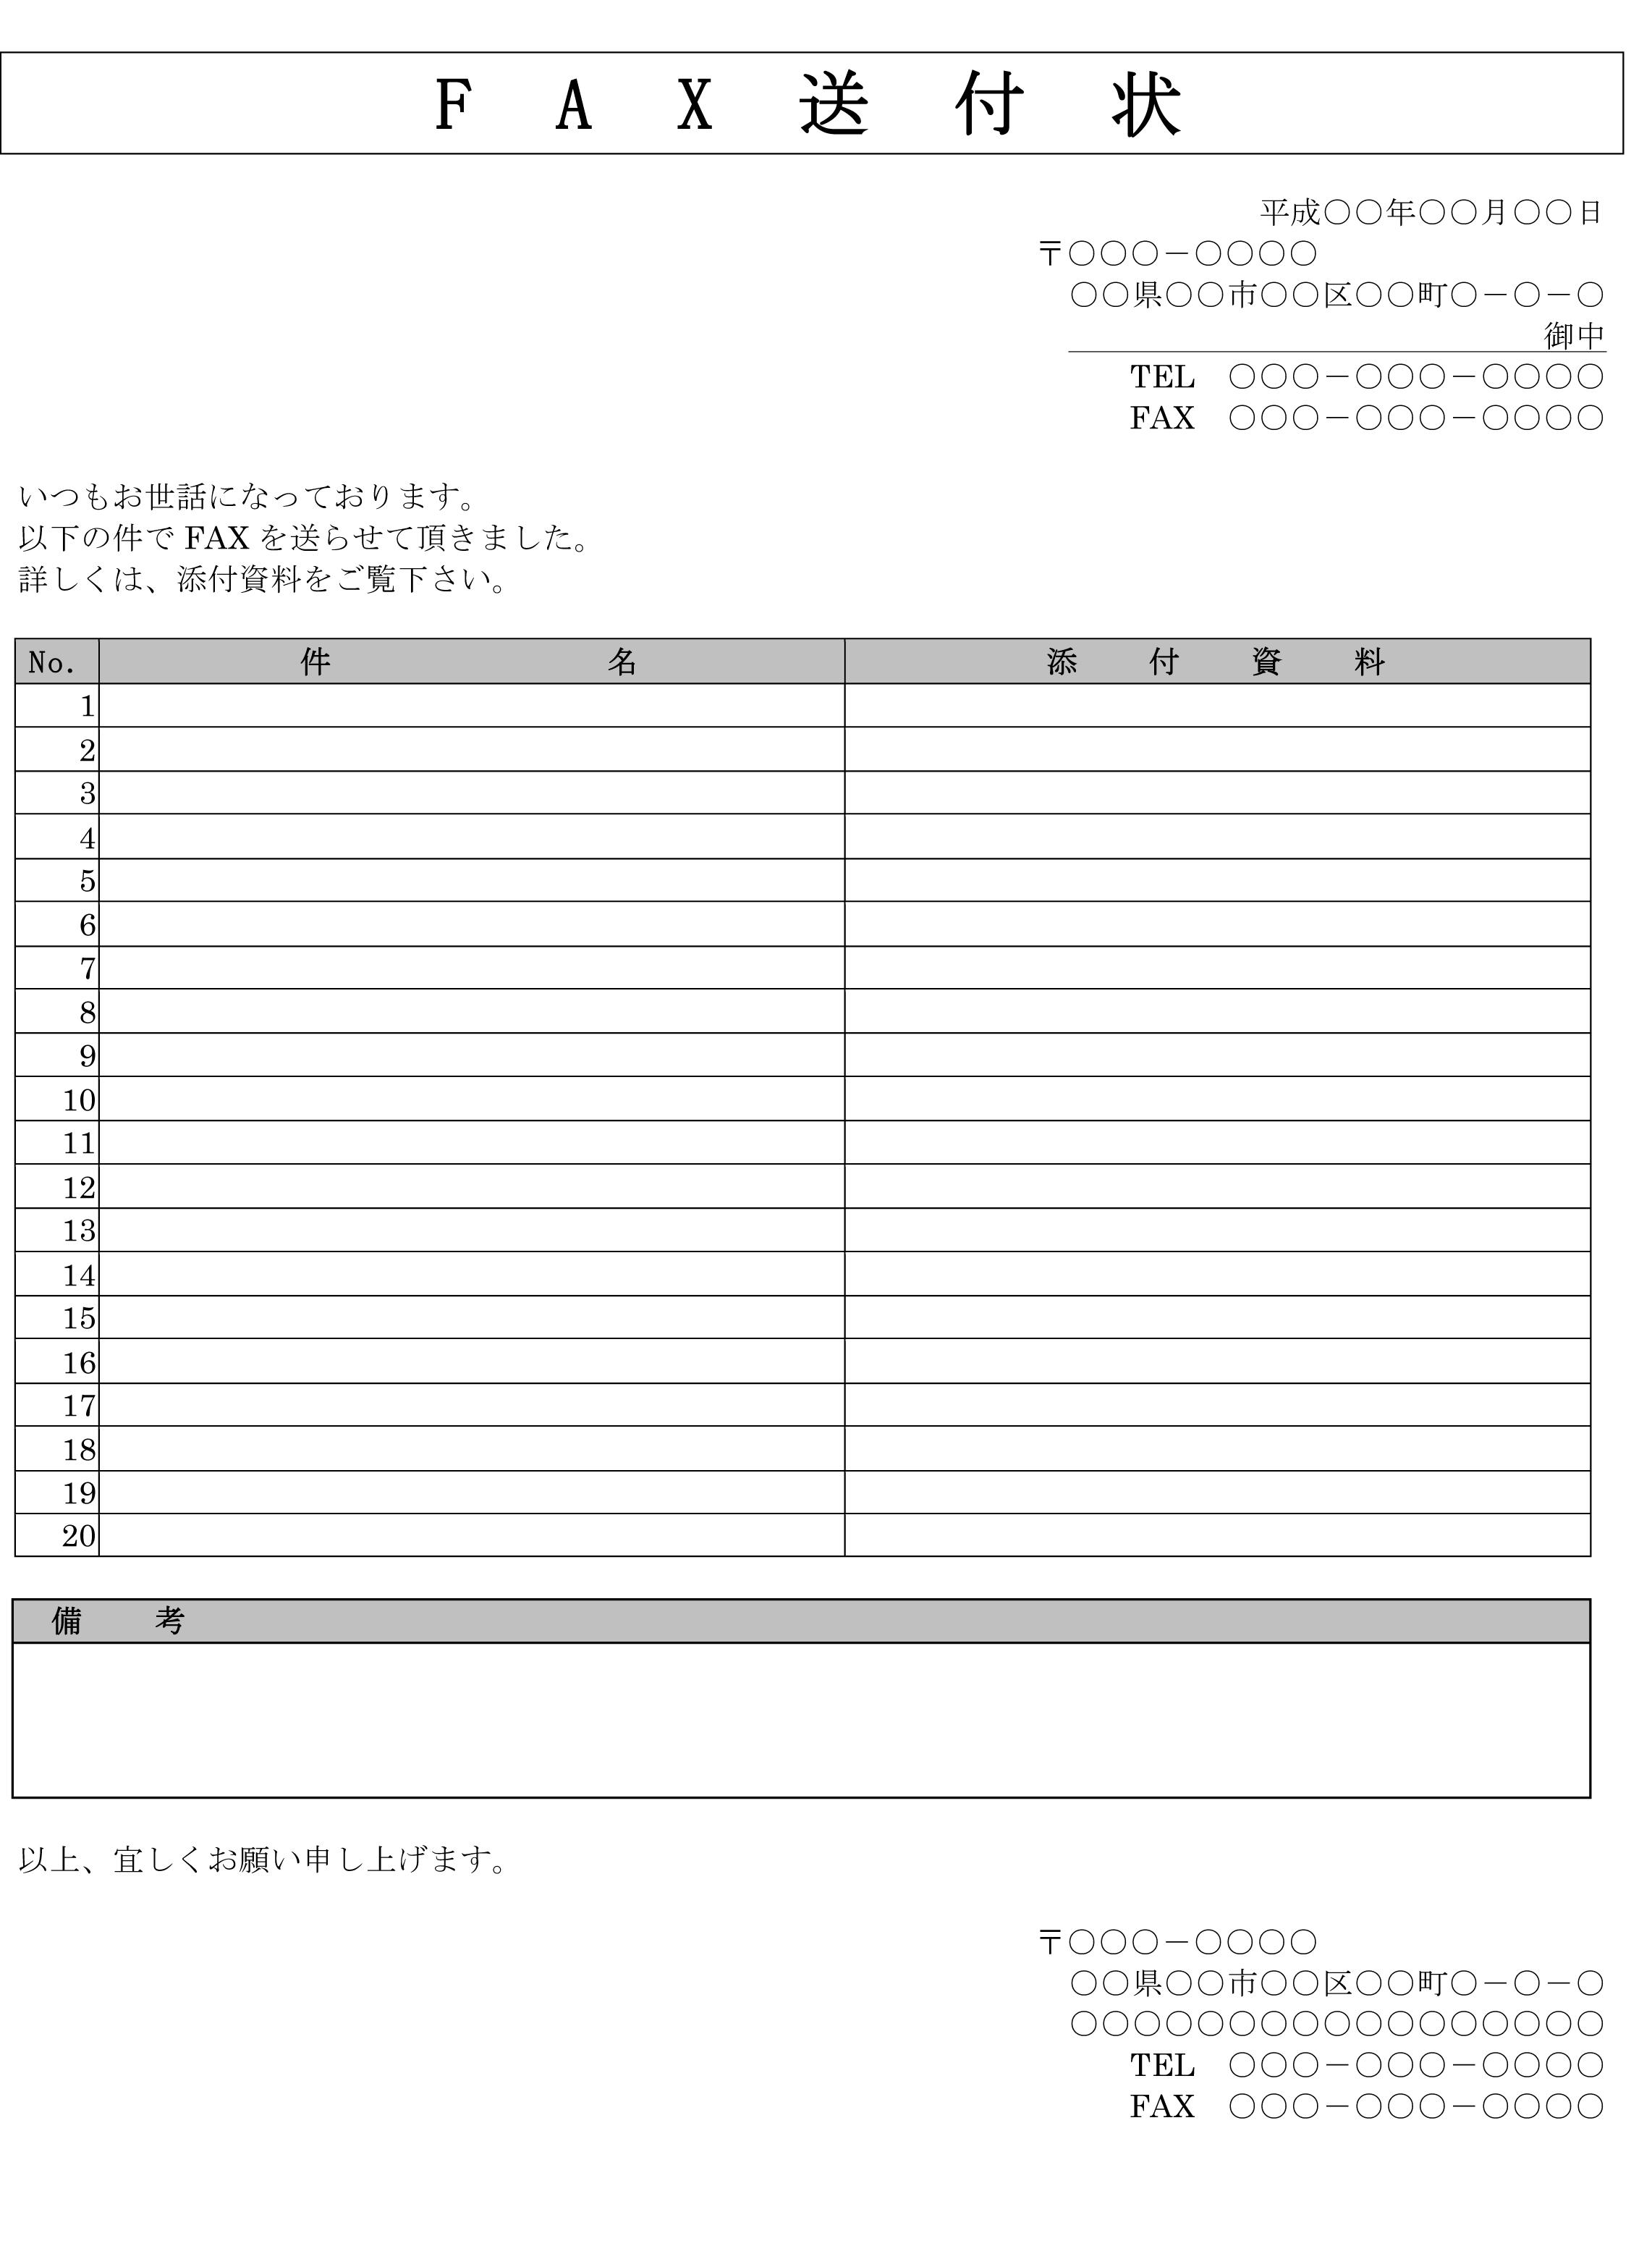 fax送付状_10